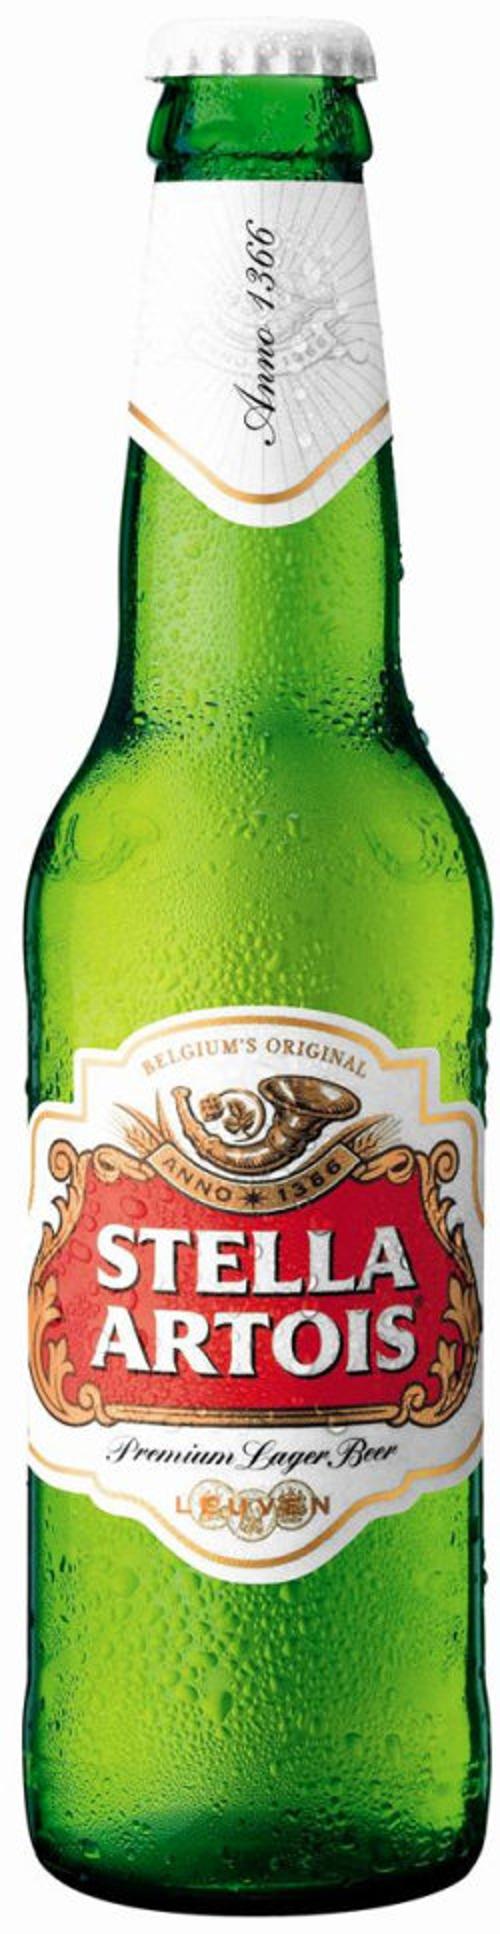 Beer by Stella Artois in Ted 2